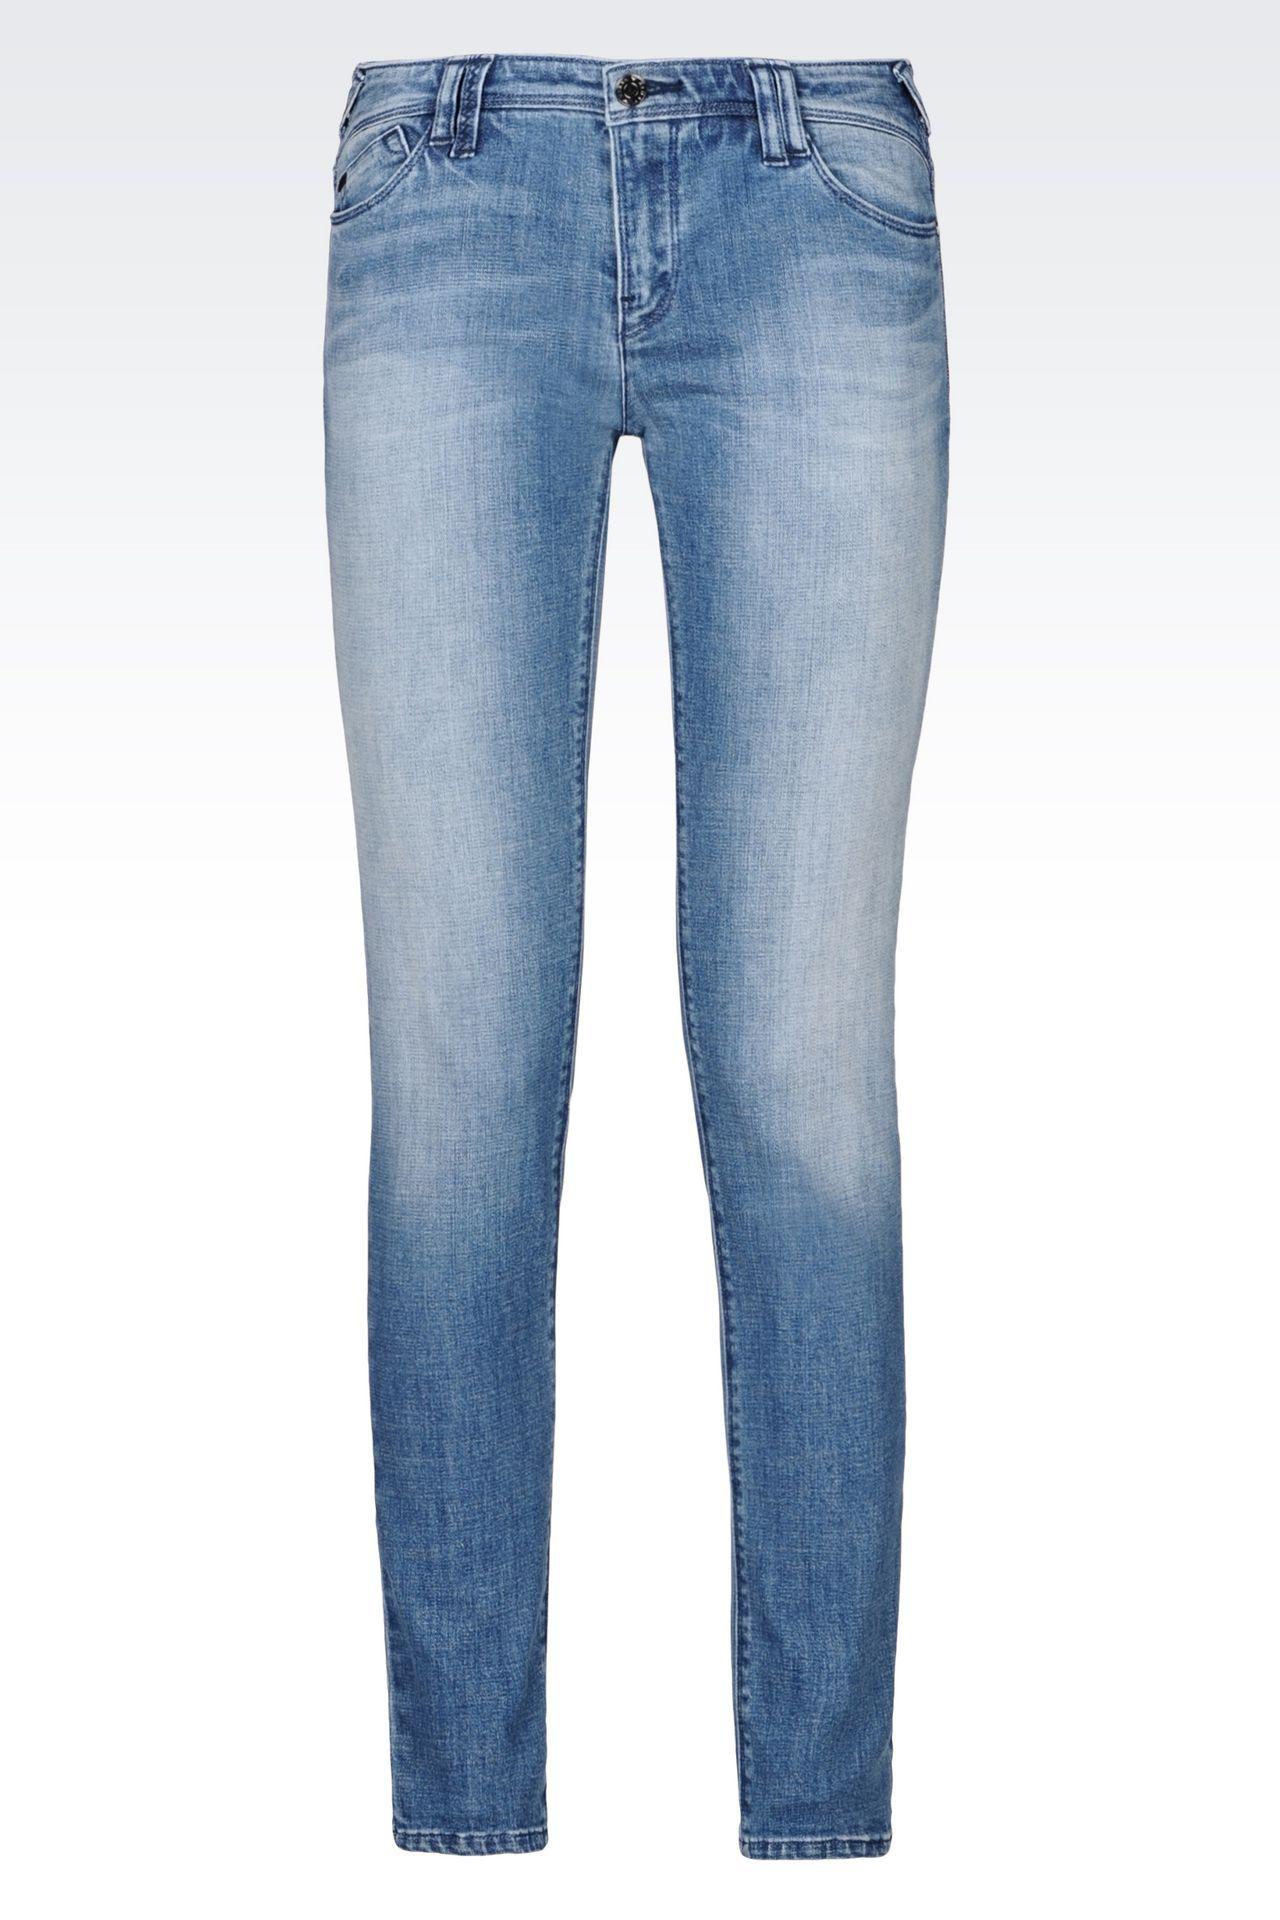 J28 SKINNY FIT LIGHT WASH JEANS: Jeans Women by Armani - 0